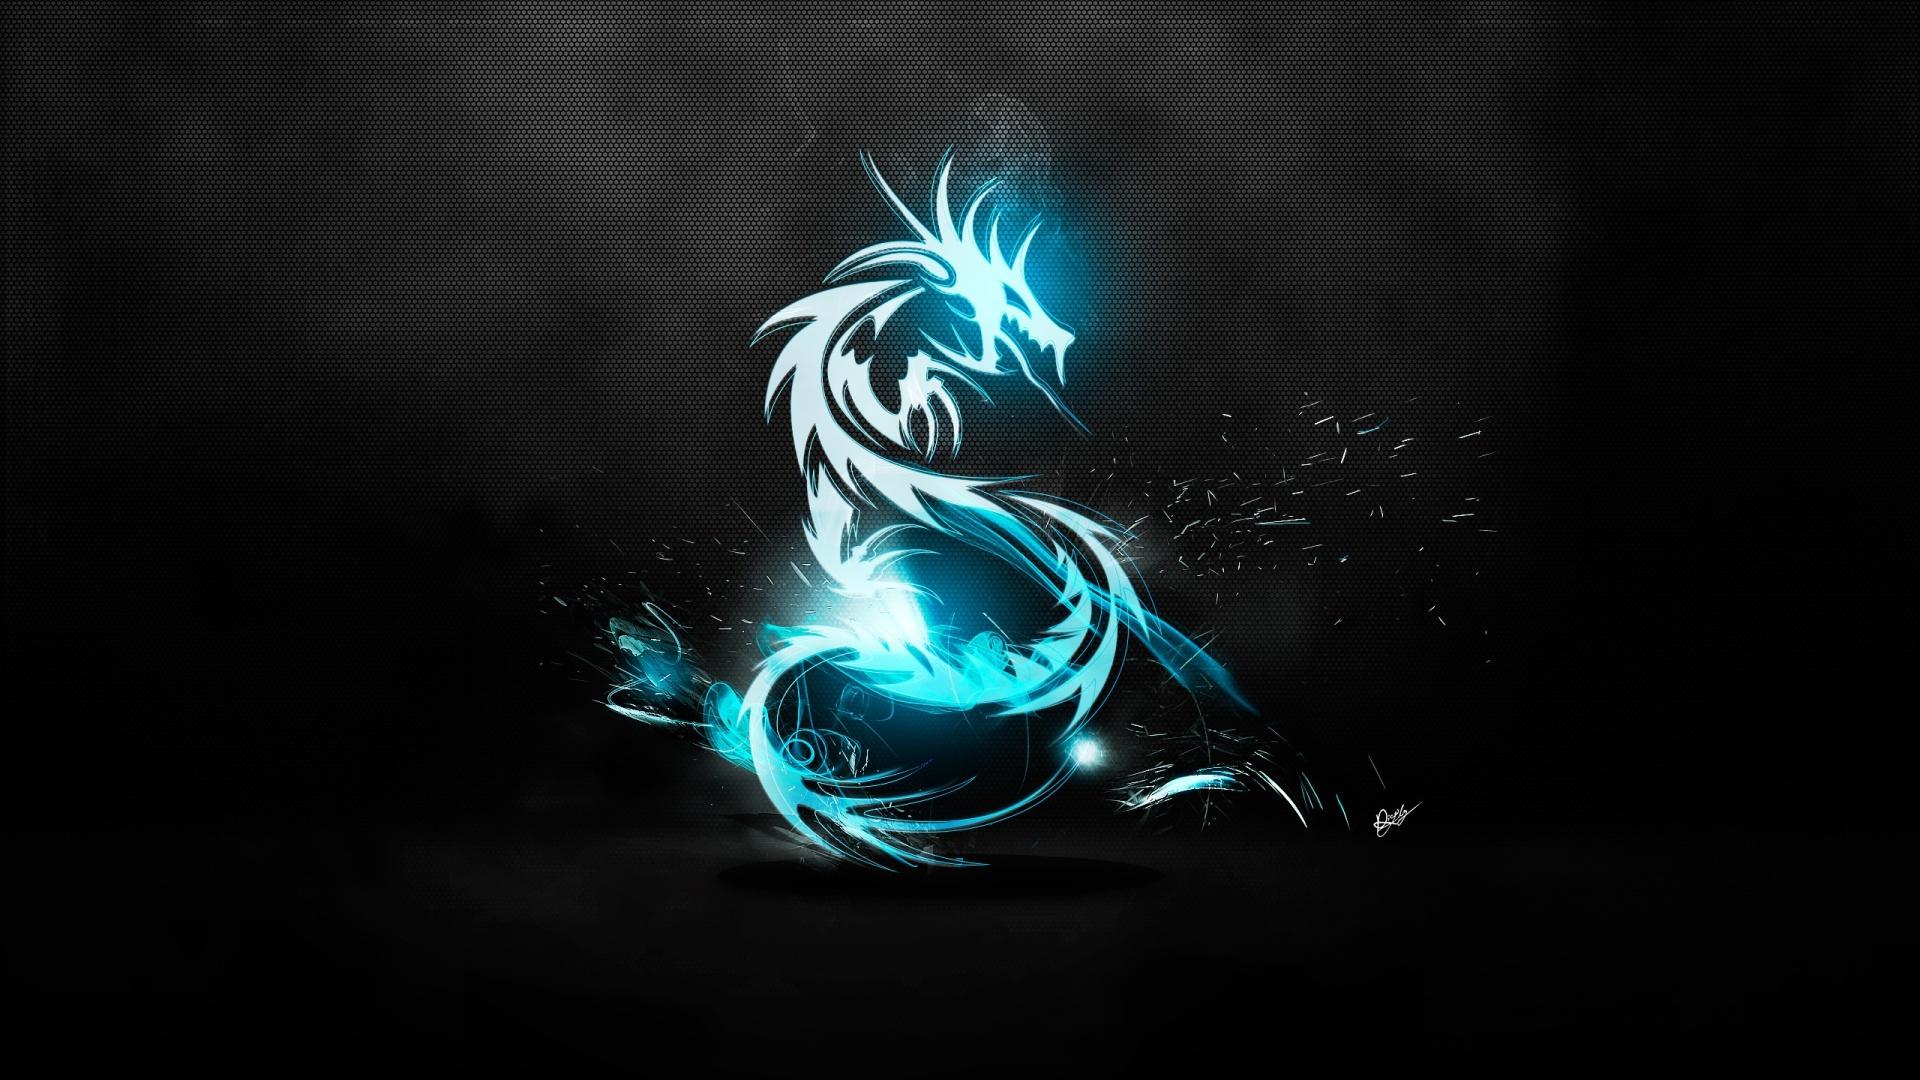 Blue Dragon Full HD Desktop Wallpapers 1080p 1920x1080